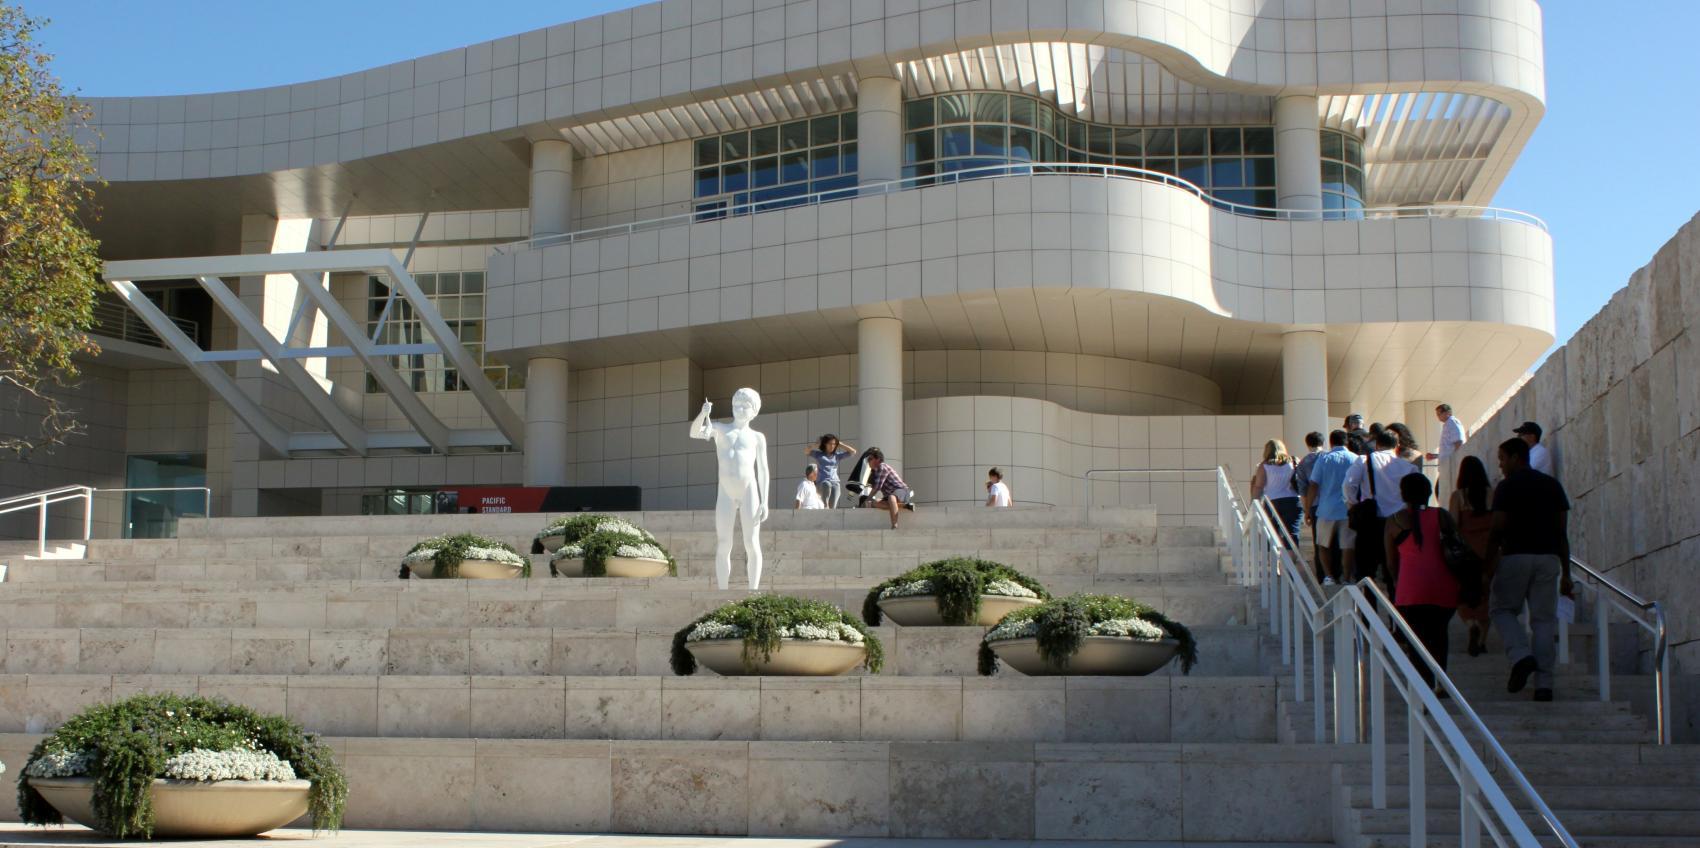 Paul Getty Museum American Public Gardens Association